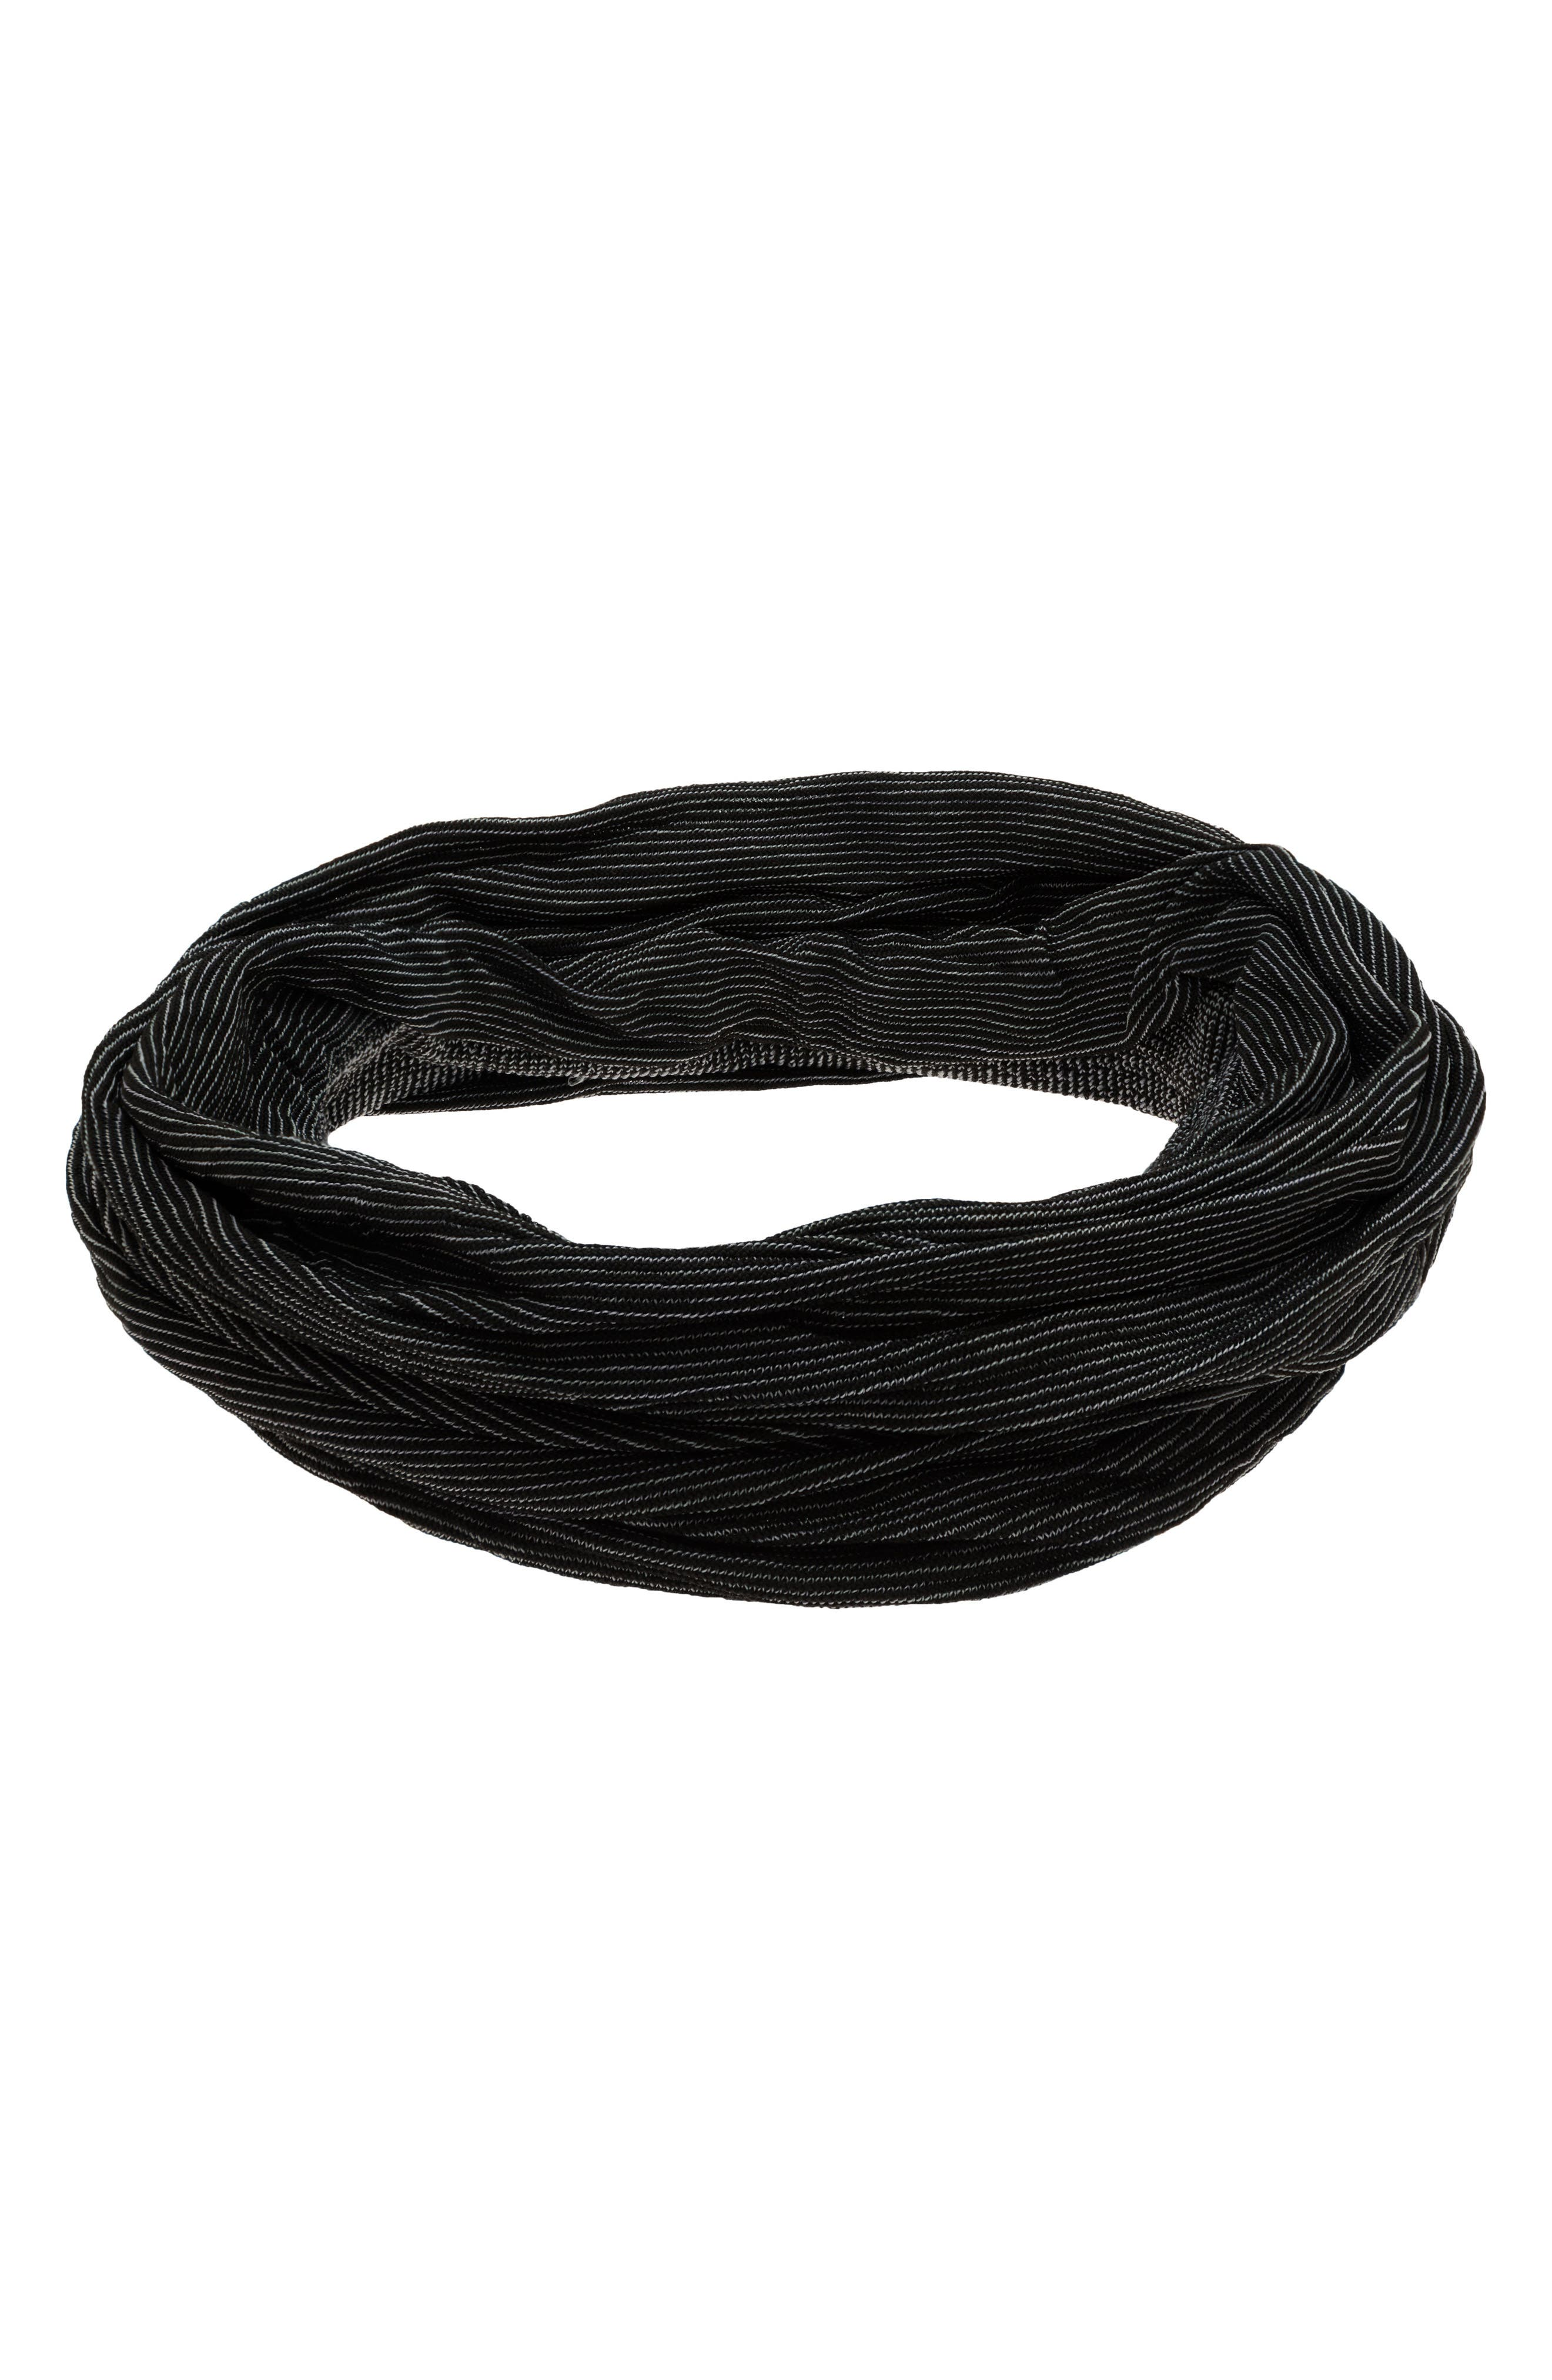 Space Dye Relaxed Turban Head Wrap,                             Alternate thumbnail 2, color,                             Black